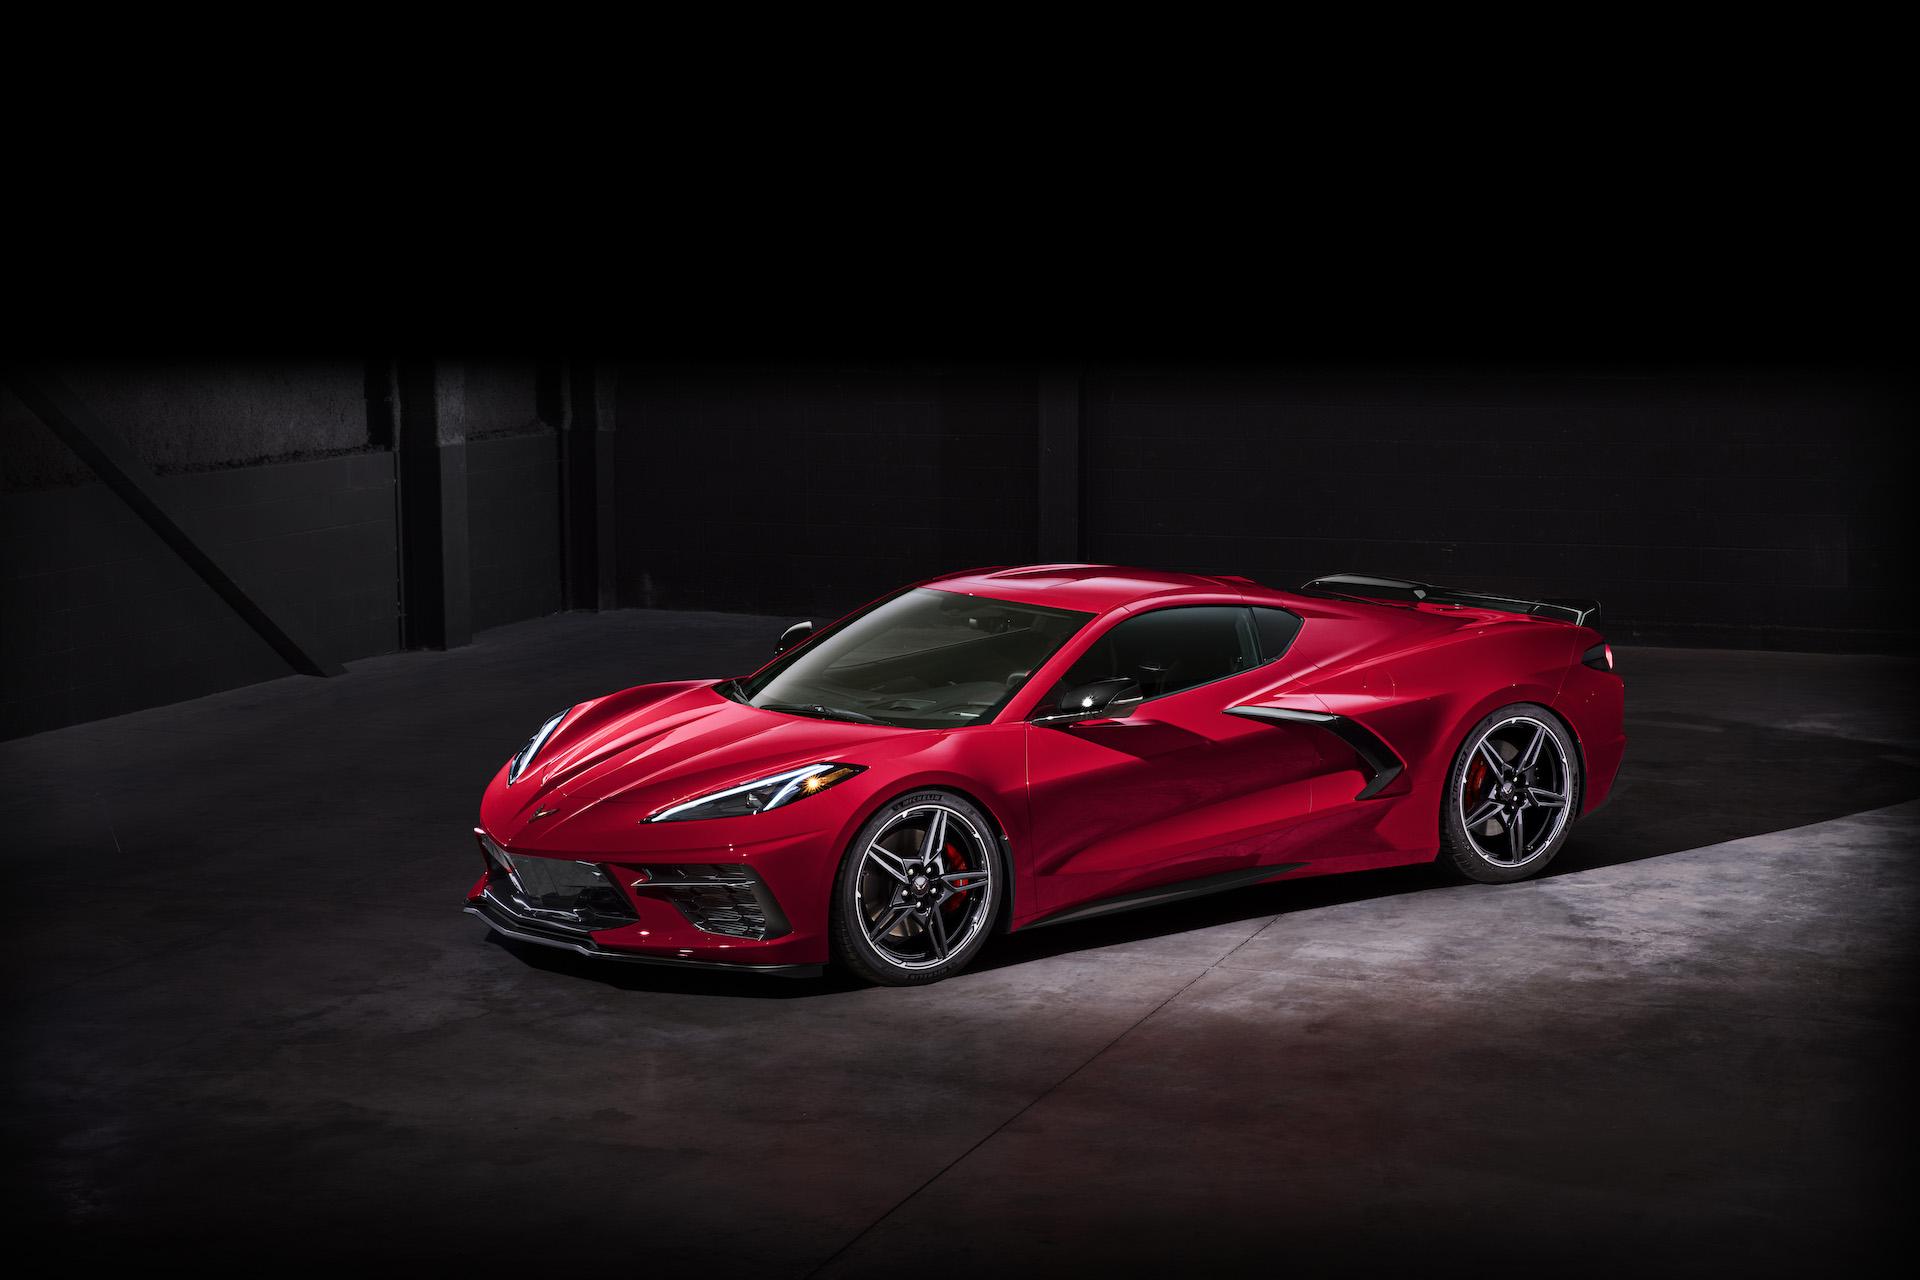 2020 Chevrolet Corvette preview